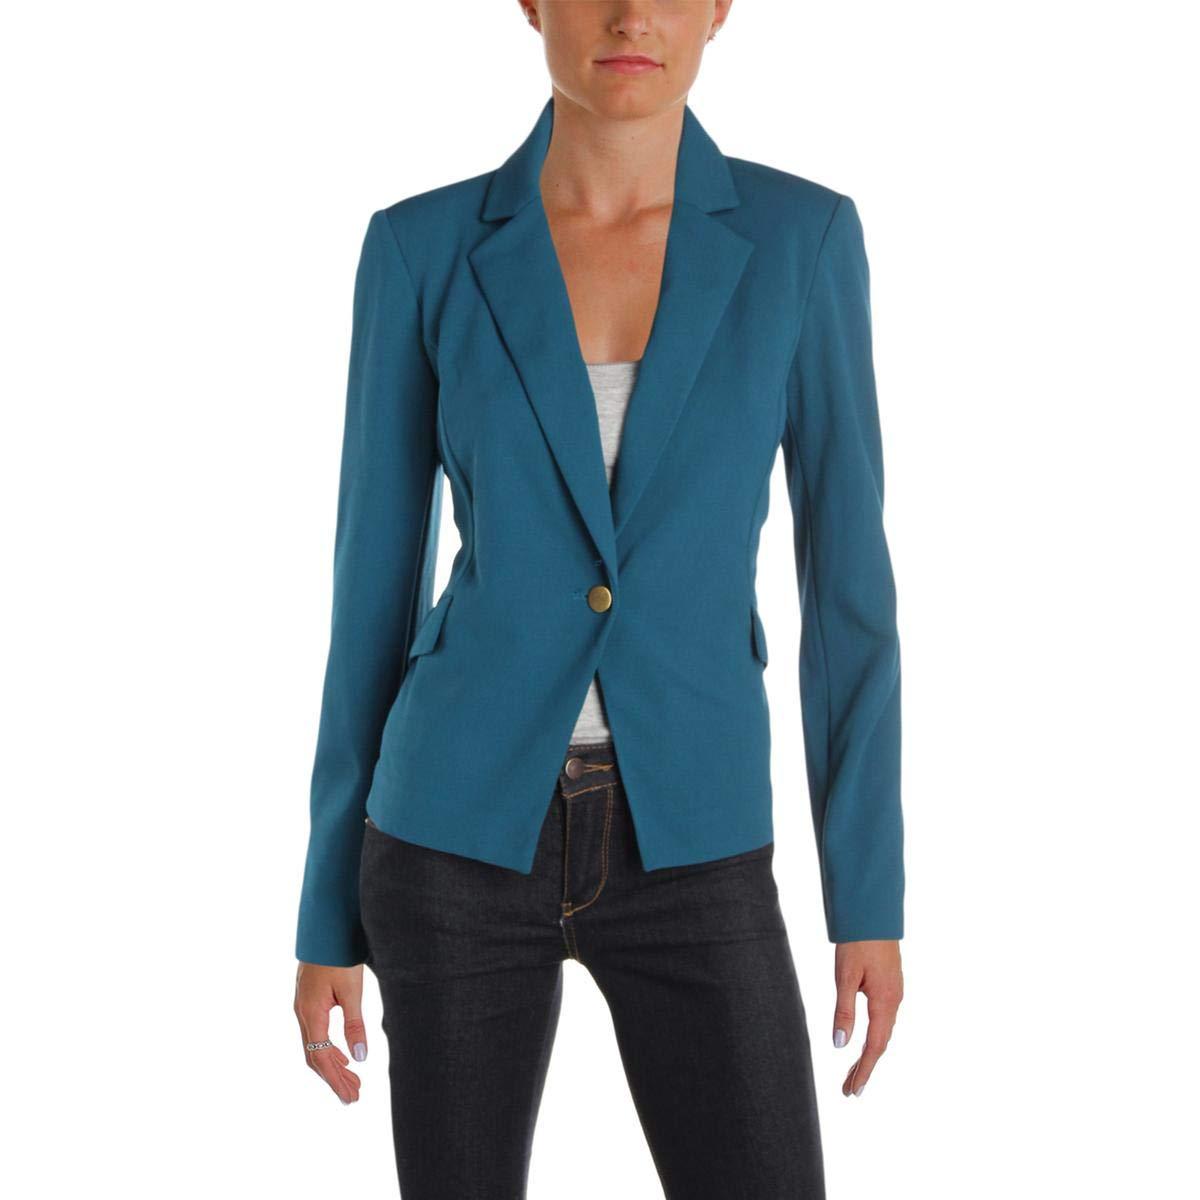 Calvin Klein Women's Petite One Button Jacket in Scuba Crepe, Cypress 6P